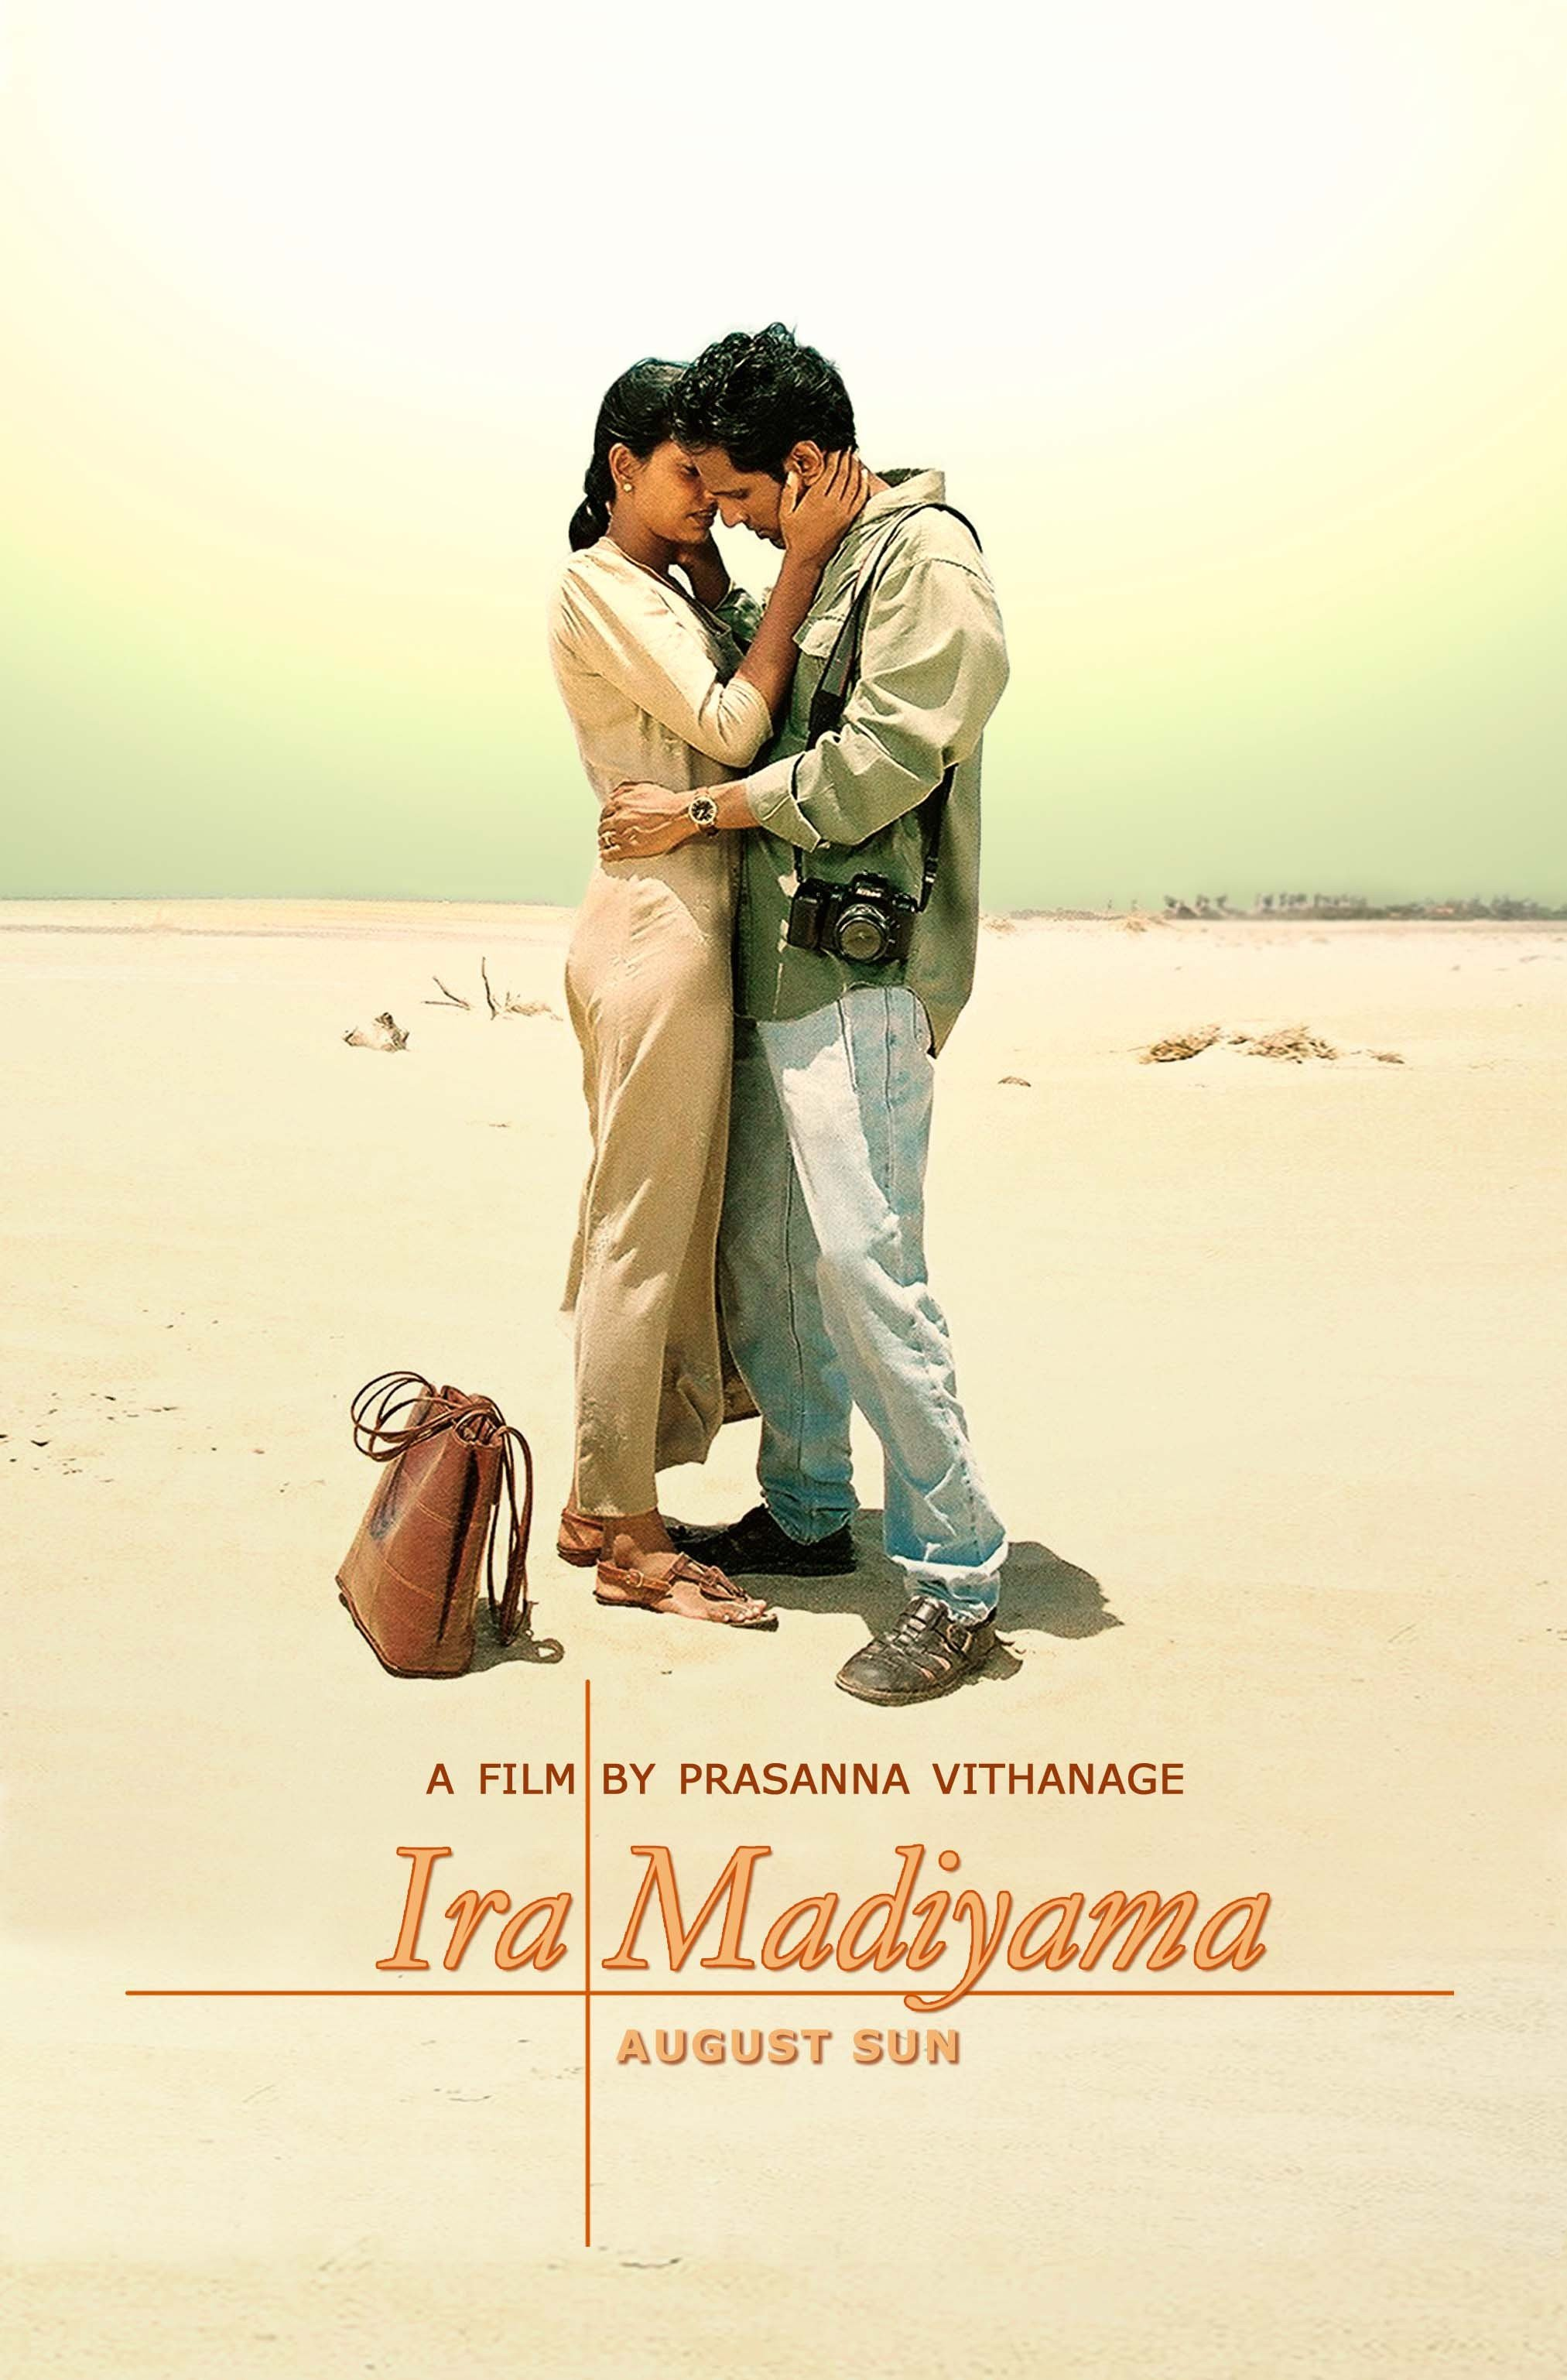 Watch ira madiyama online dating